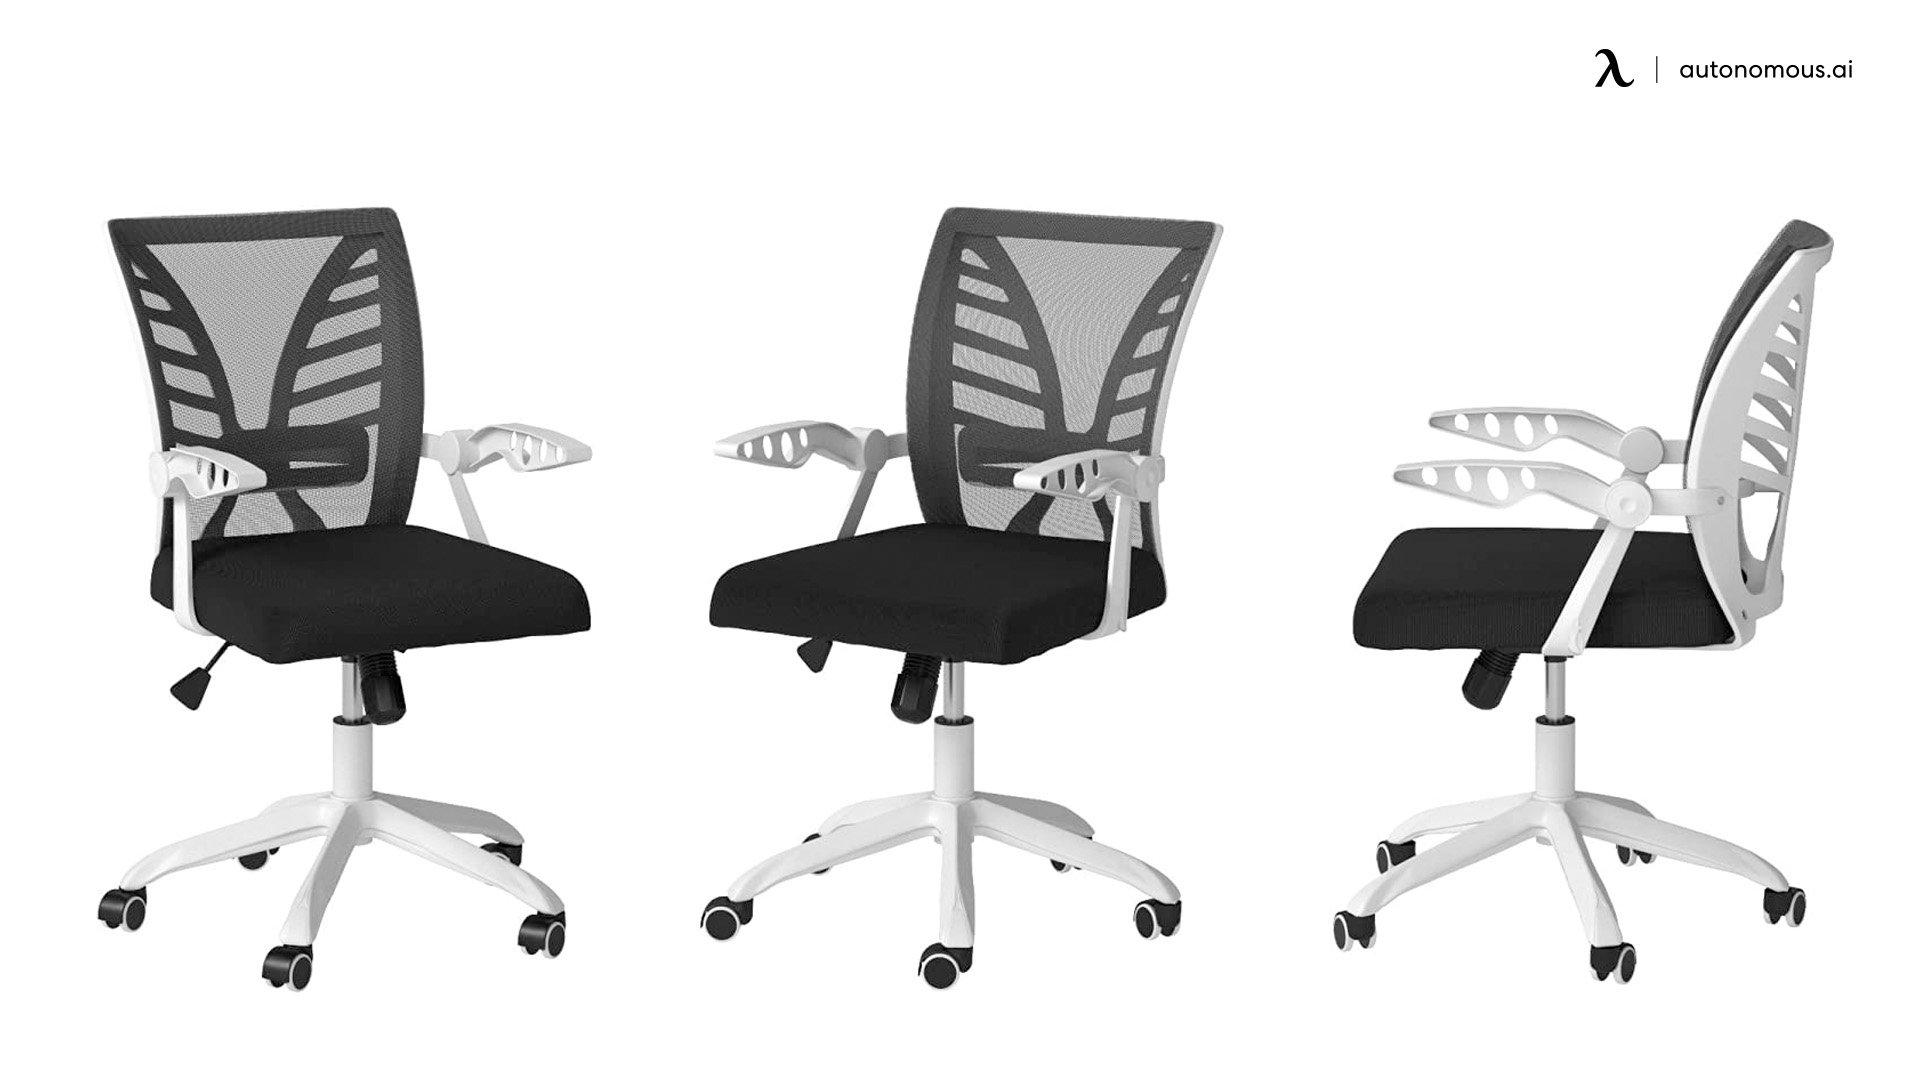 NOBLEWELL Ergonomic Office Chair